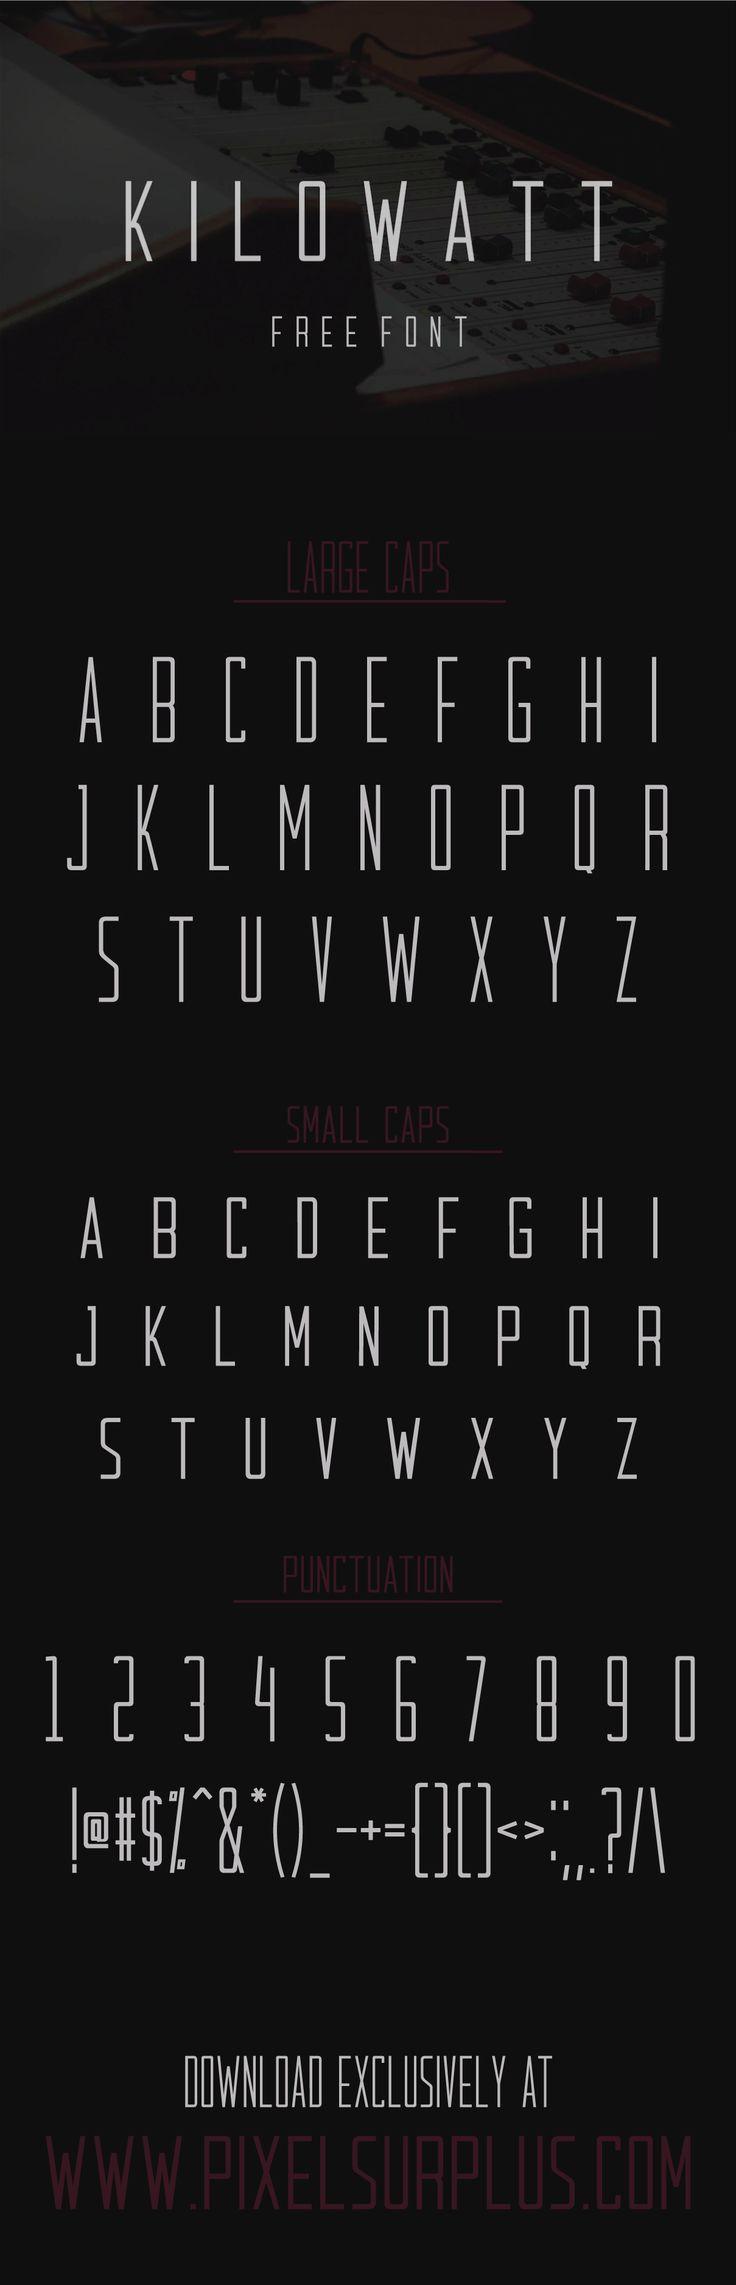 Kilowatt - Free Condensed Sans Serif Font